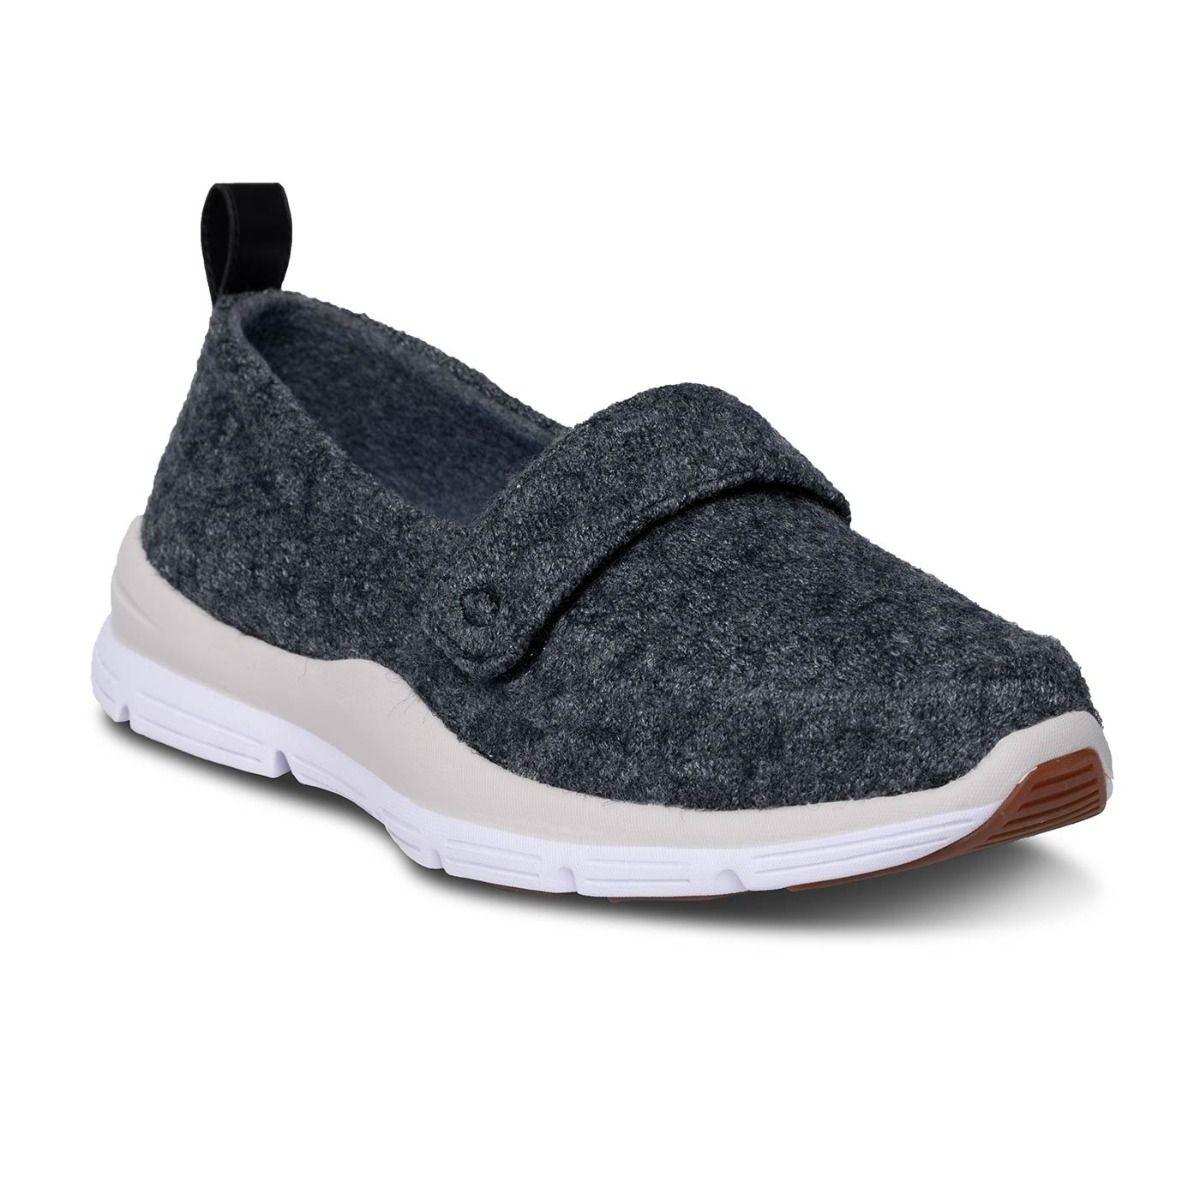 Autumn Women's - Casual Espadrille Wool Shoe